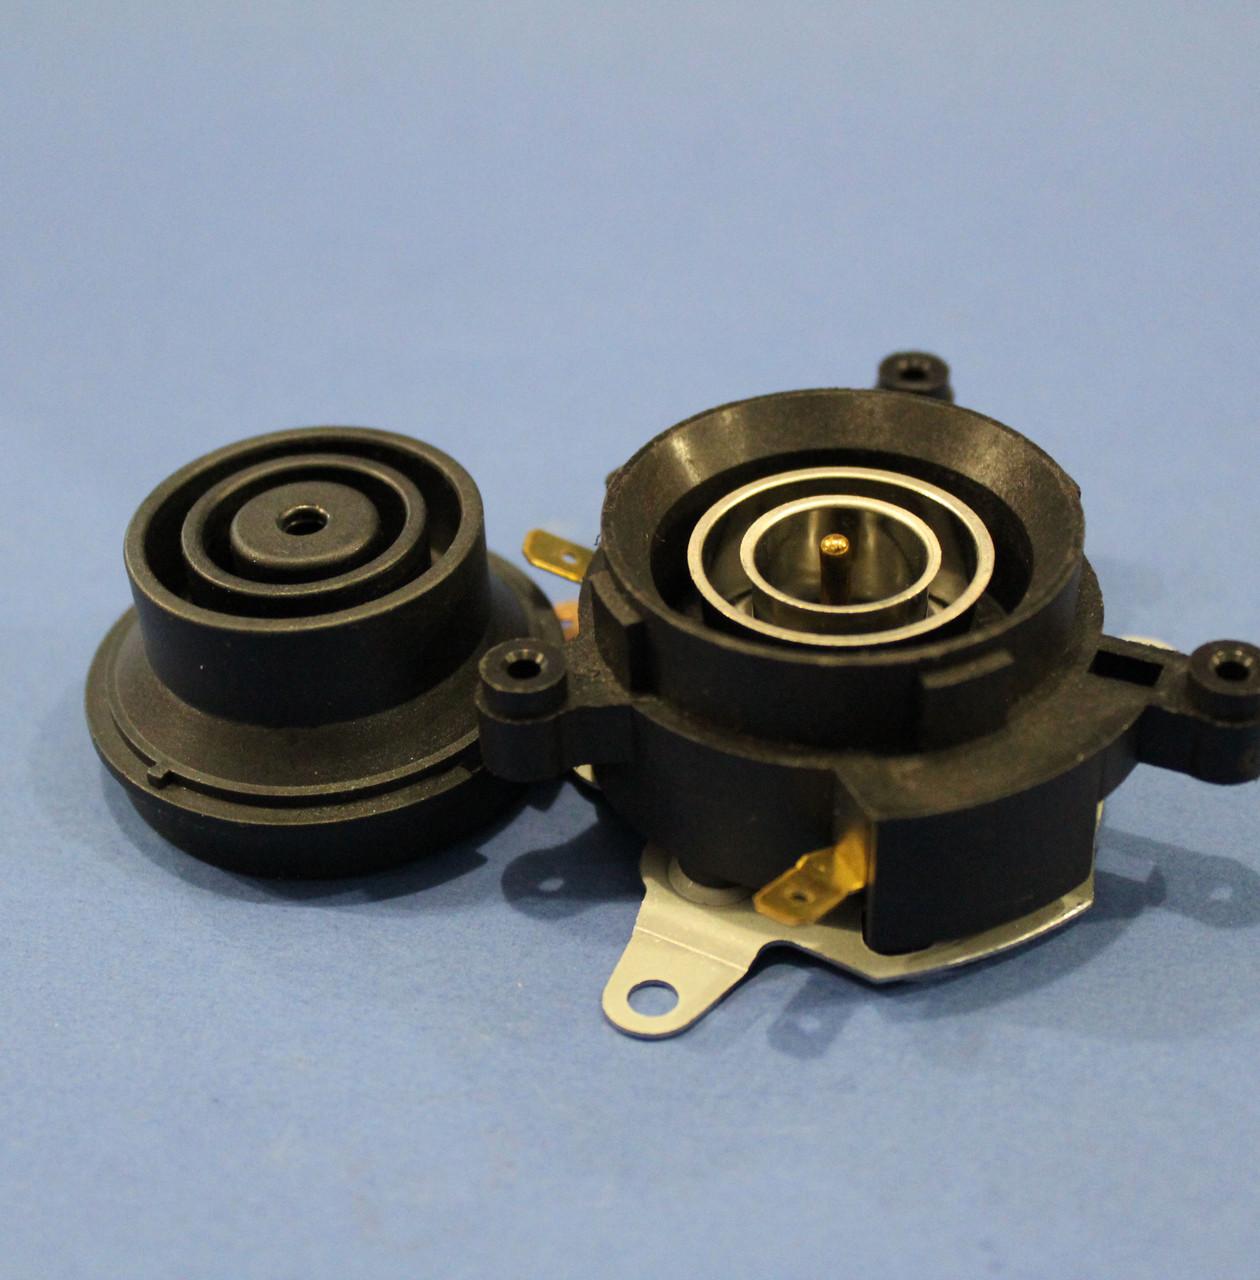 Автоматика чайника с дисковым теном ХВО-1 (комплект)